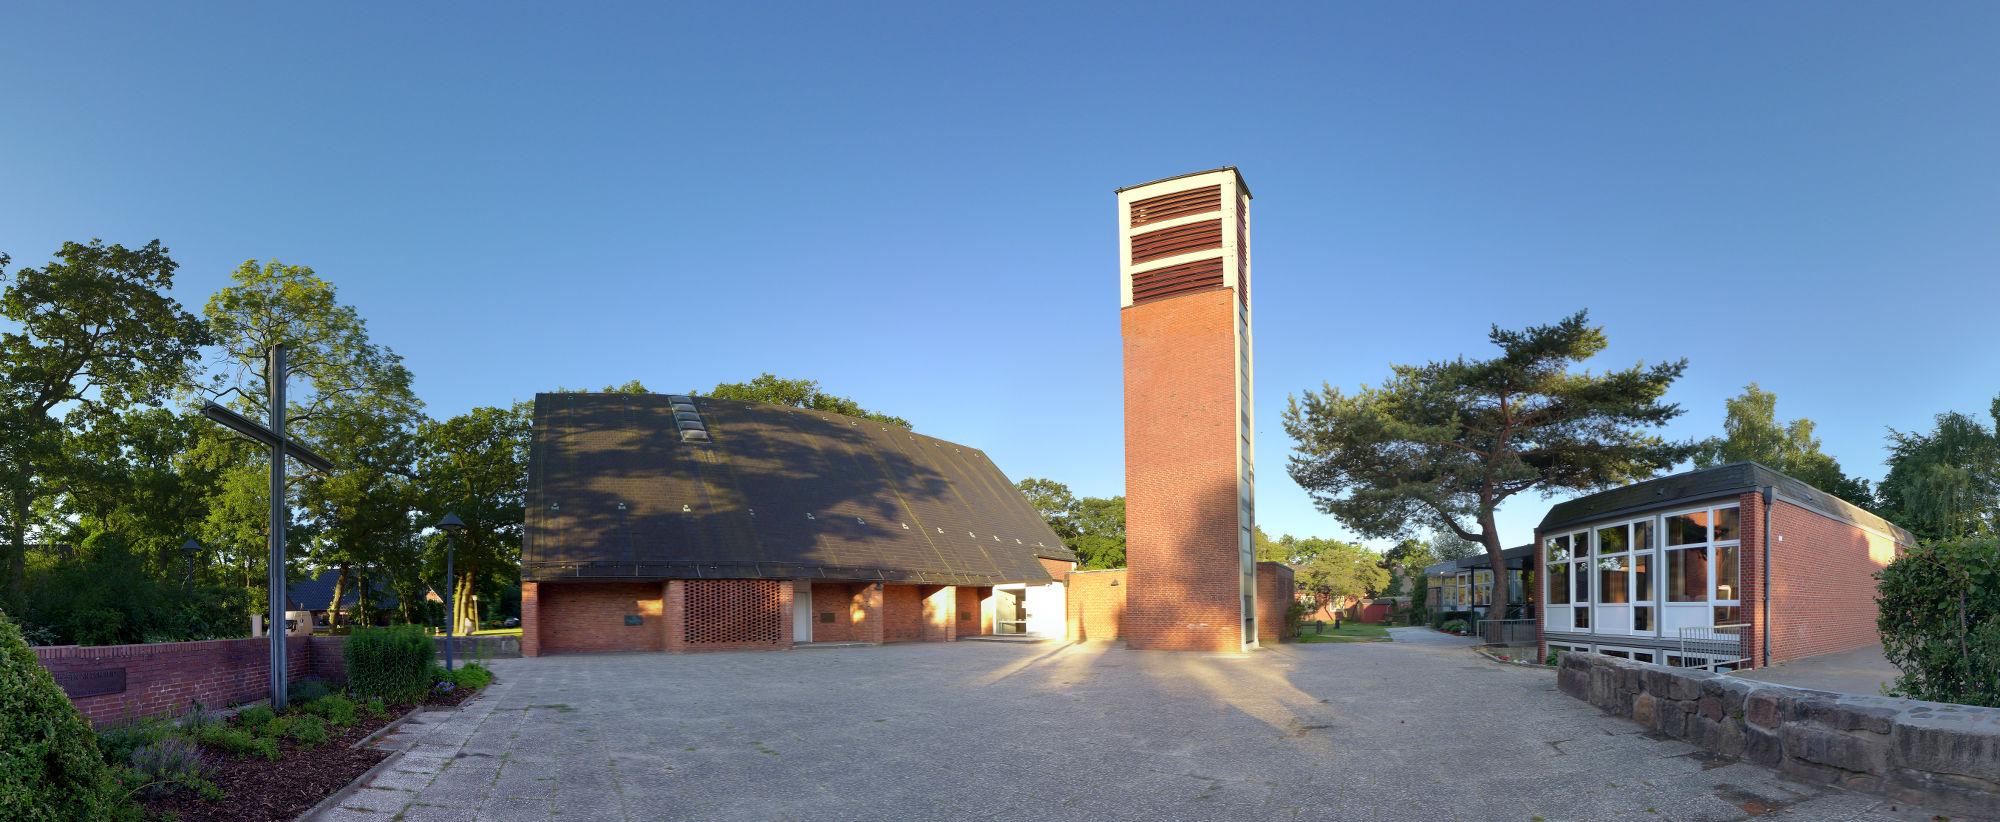 Panoramaaufnahme Cornelius-Kirche mit Kirchhof